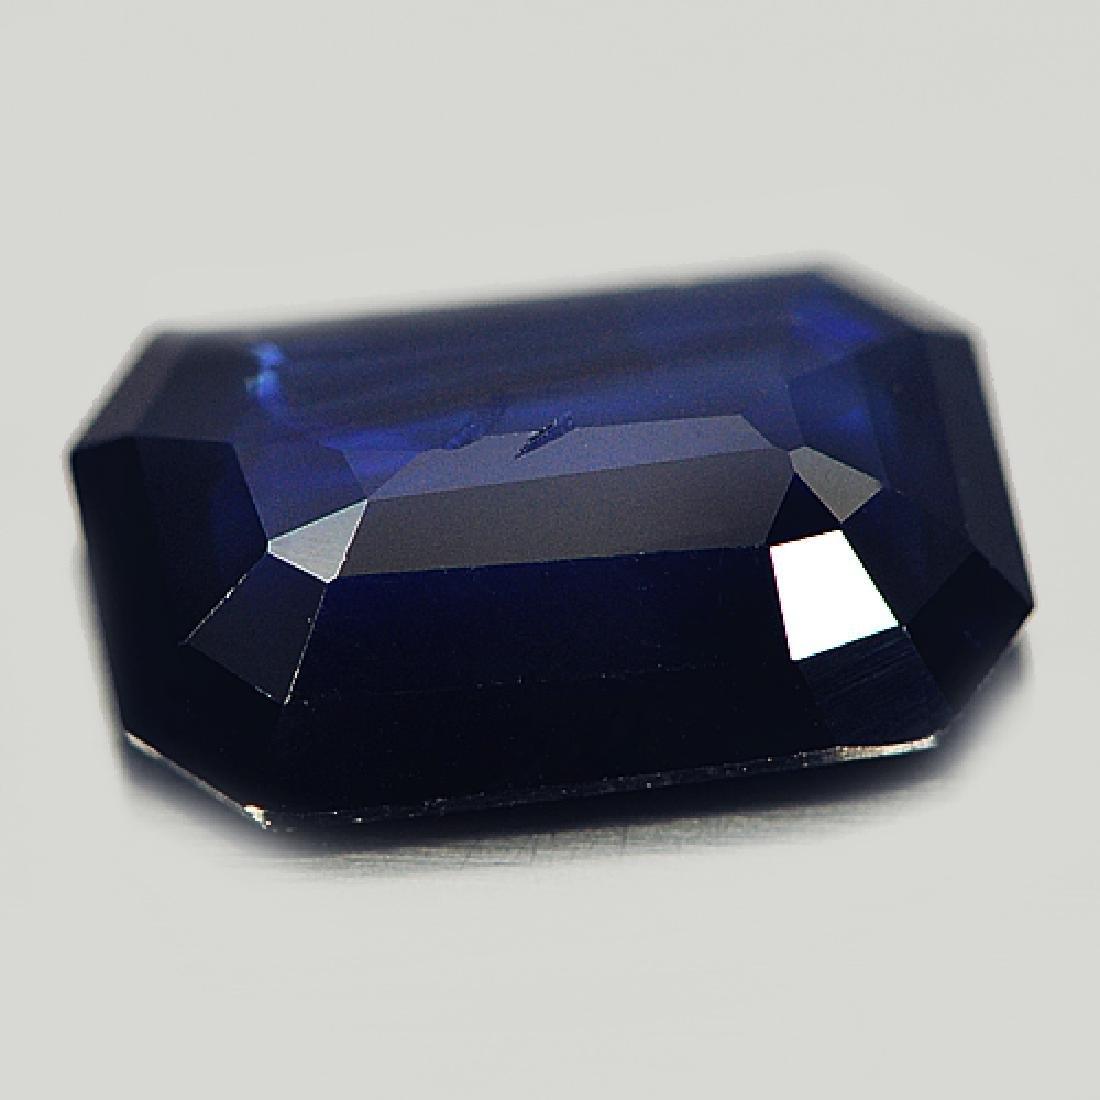 Ceritfied 1.92 Ct. Octagon Shape Natural Blue Sapphire - 3